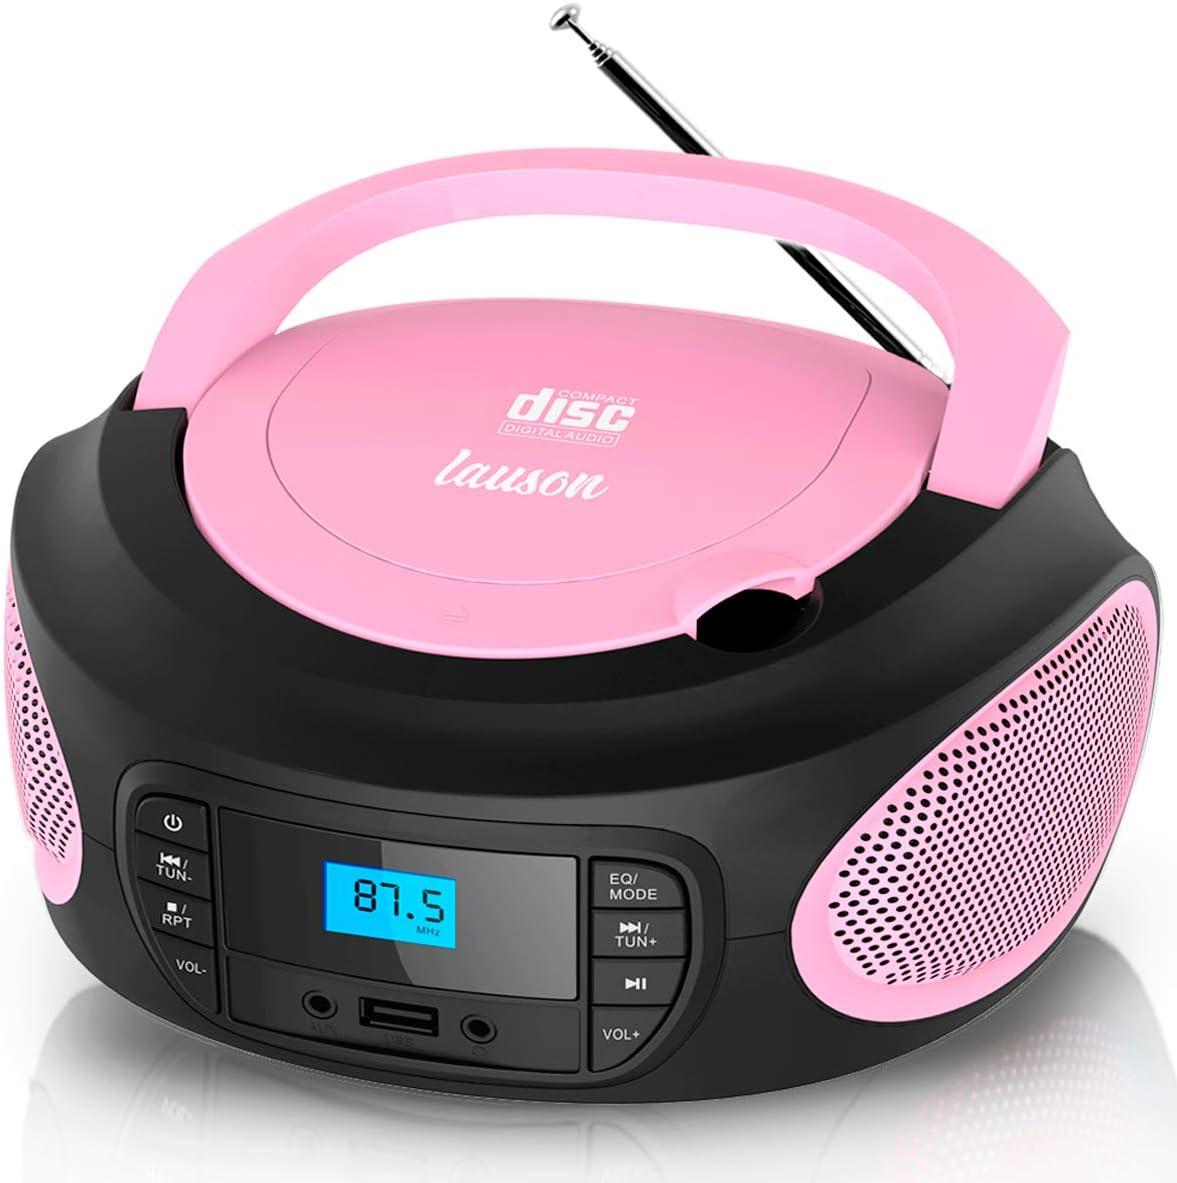 Lauson Llb995 Tragbarer Cd Player Cd Radio Boombox Elektronik